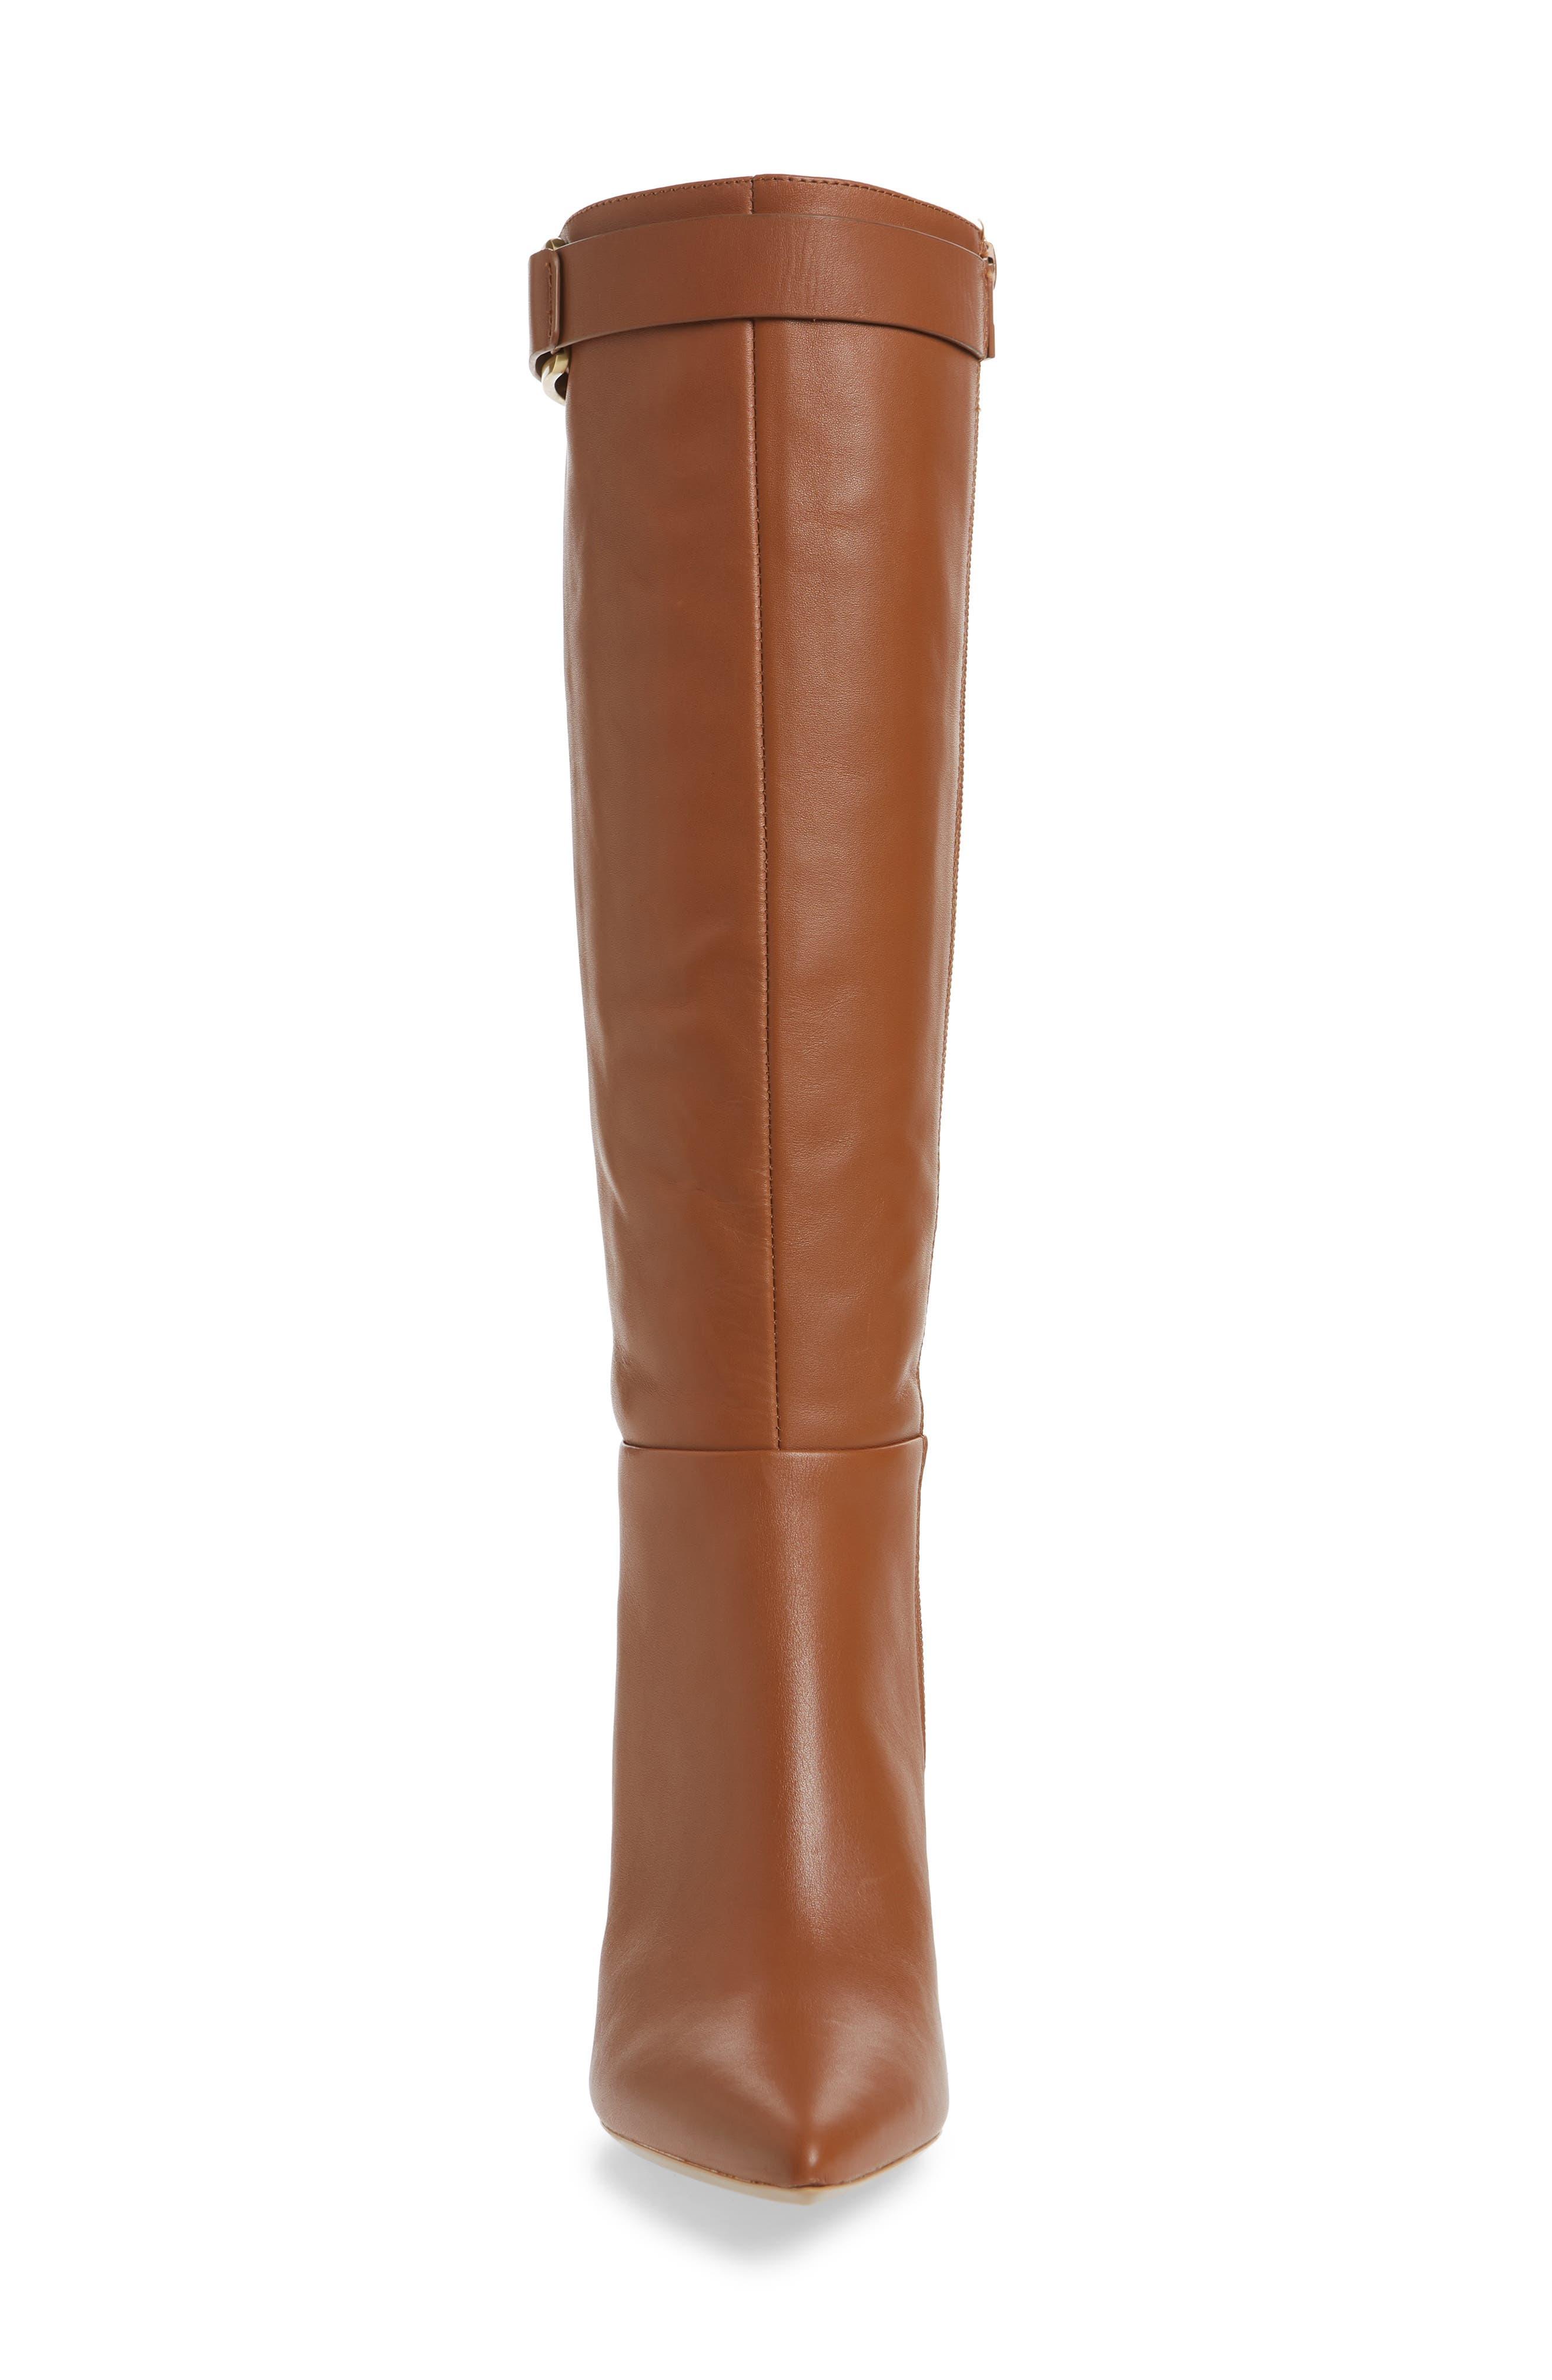 Glydia Stiletto Knee High Boot,                             Alternate thumbnail 4, color,                             COGNAC LEATHER